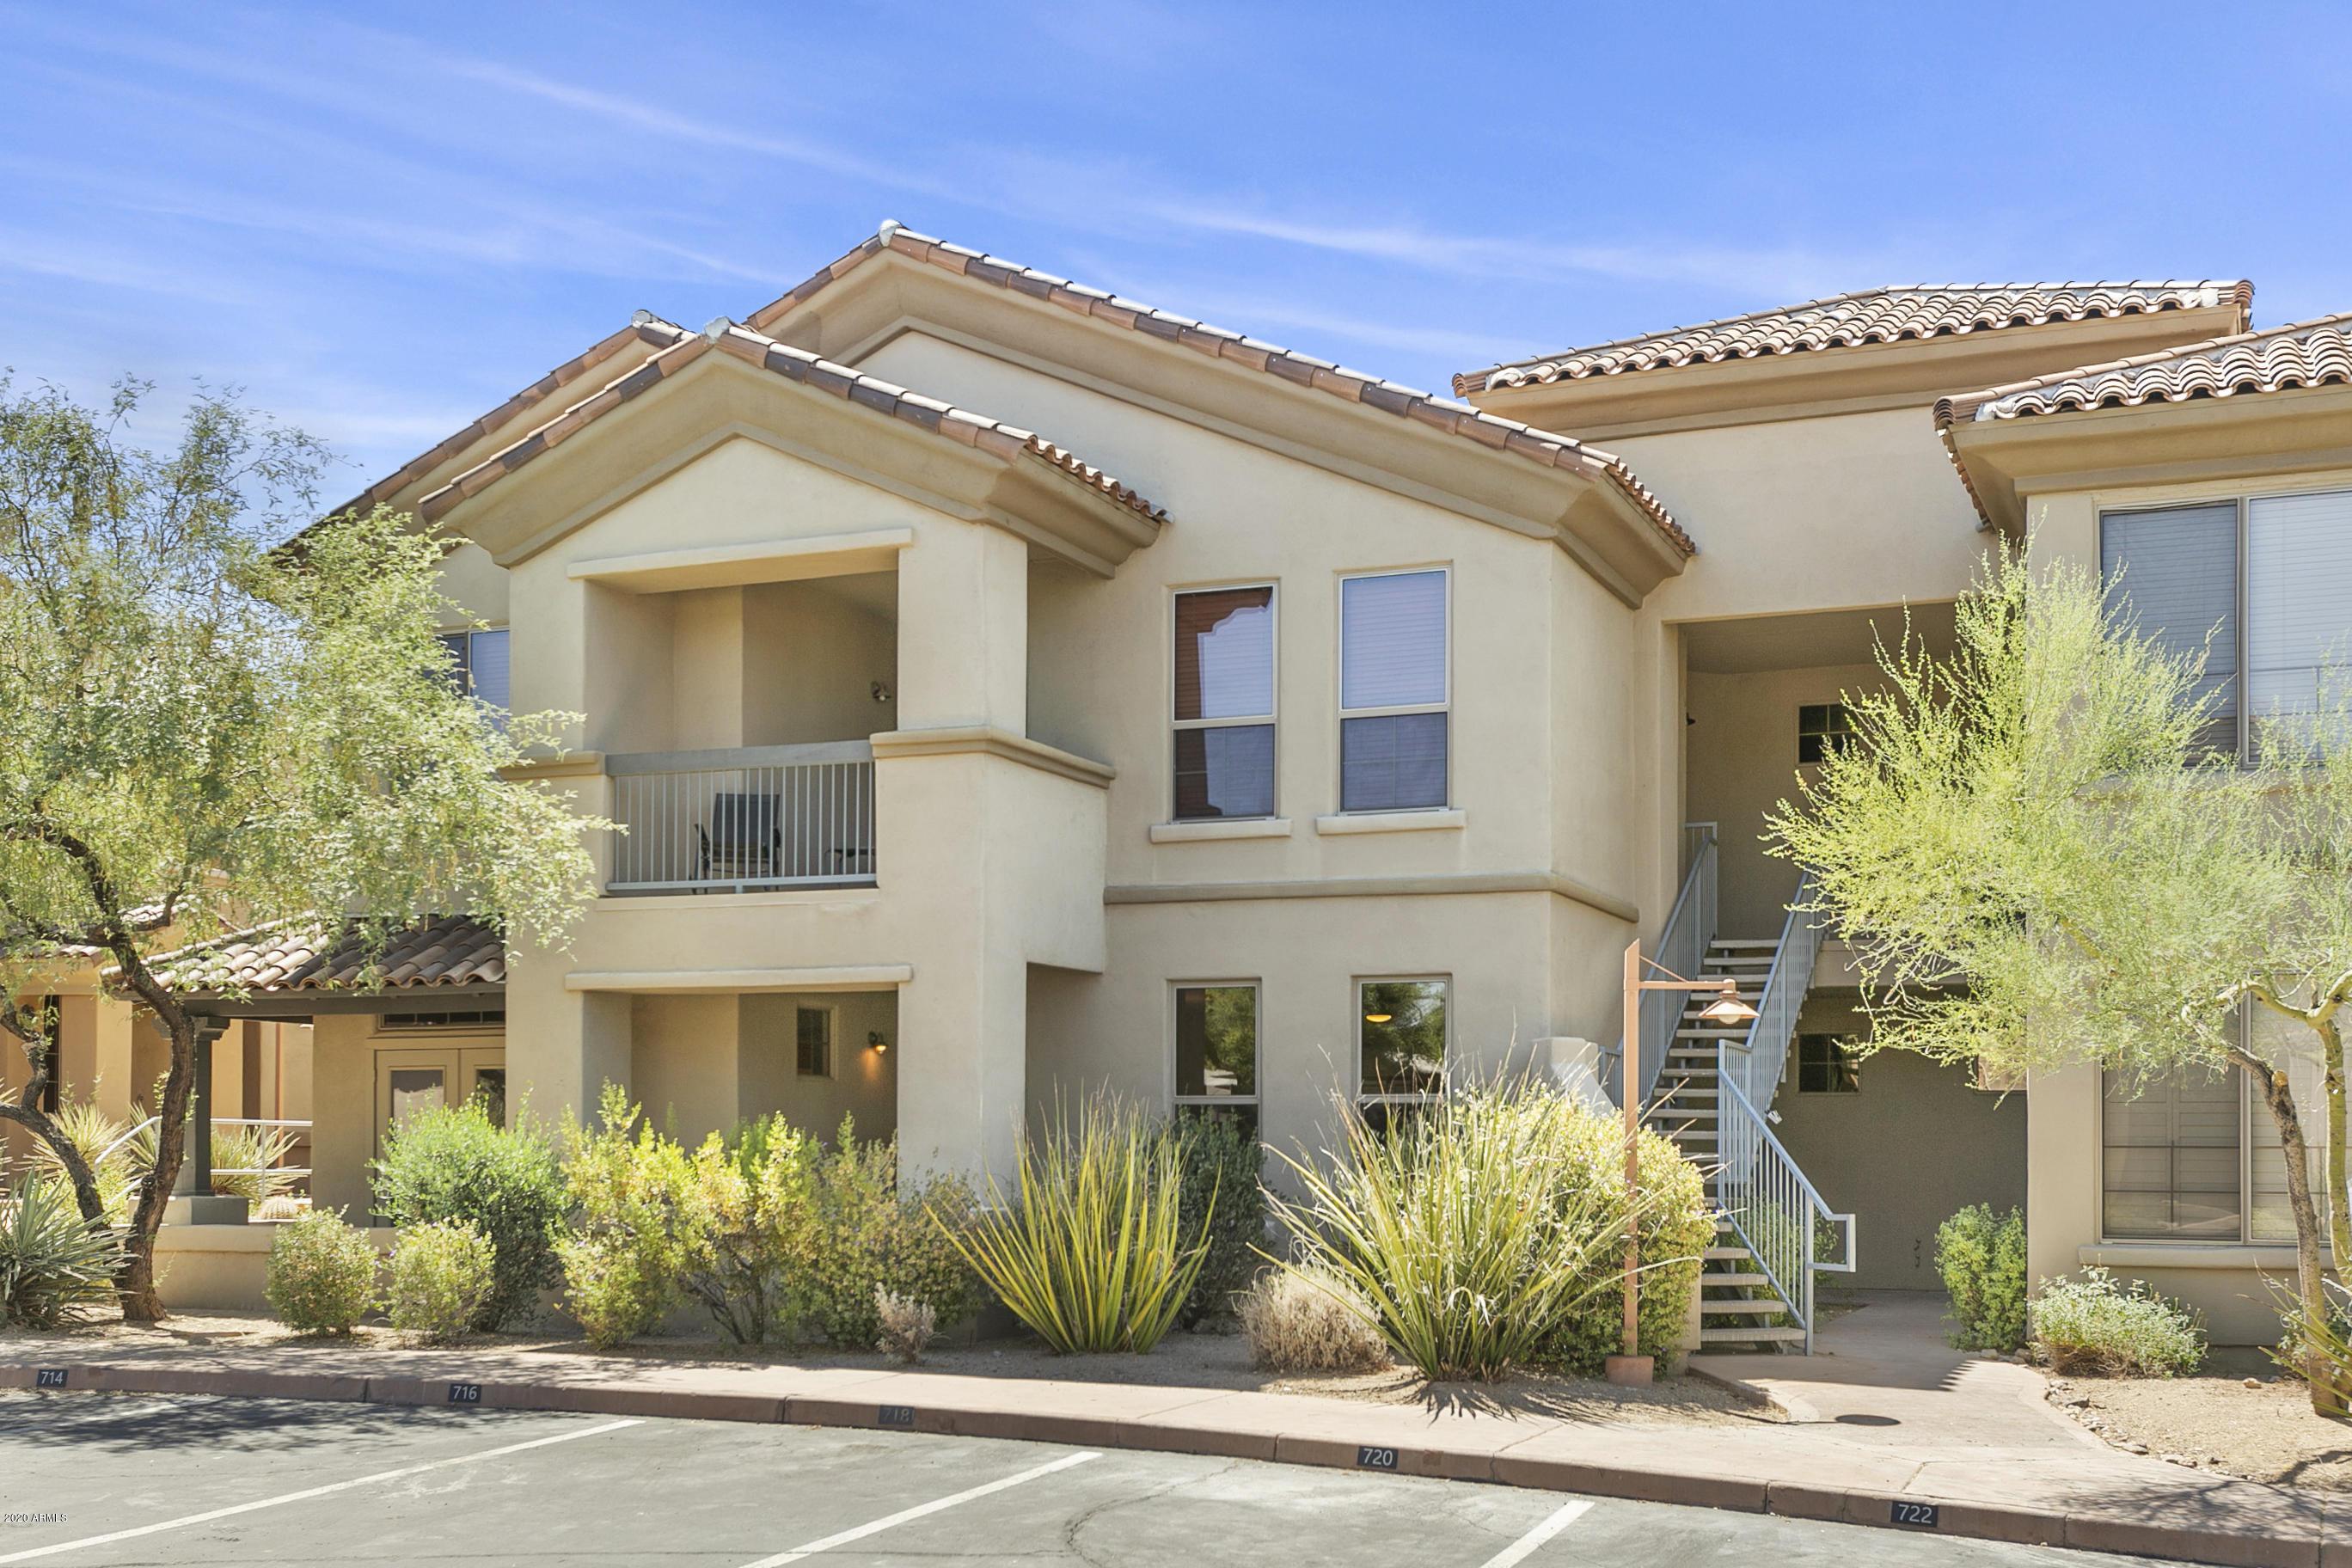 Photo of 20801 N 90th Place -- #165, Scottsdale, AZ 85255